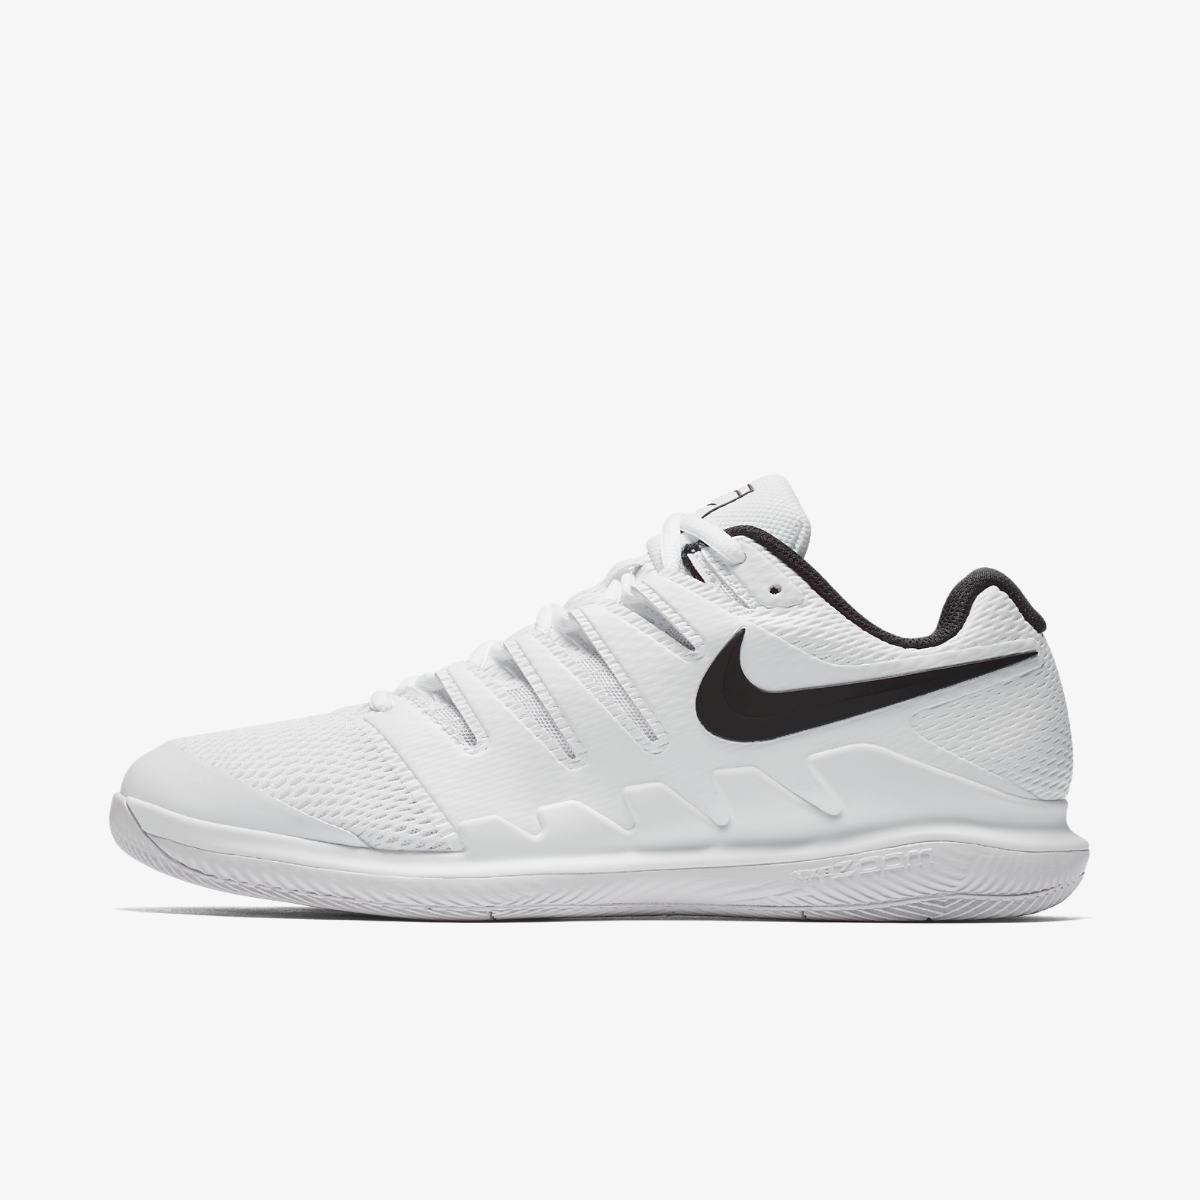 598f2c0bb1d6 Кроссовки для тенниса Nike AIR ZOOM VAPOR X HC